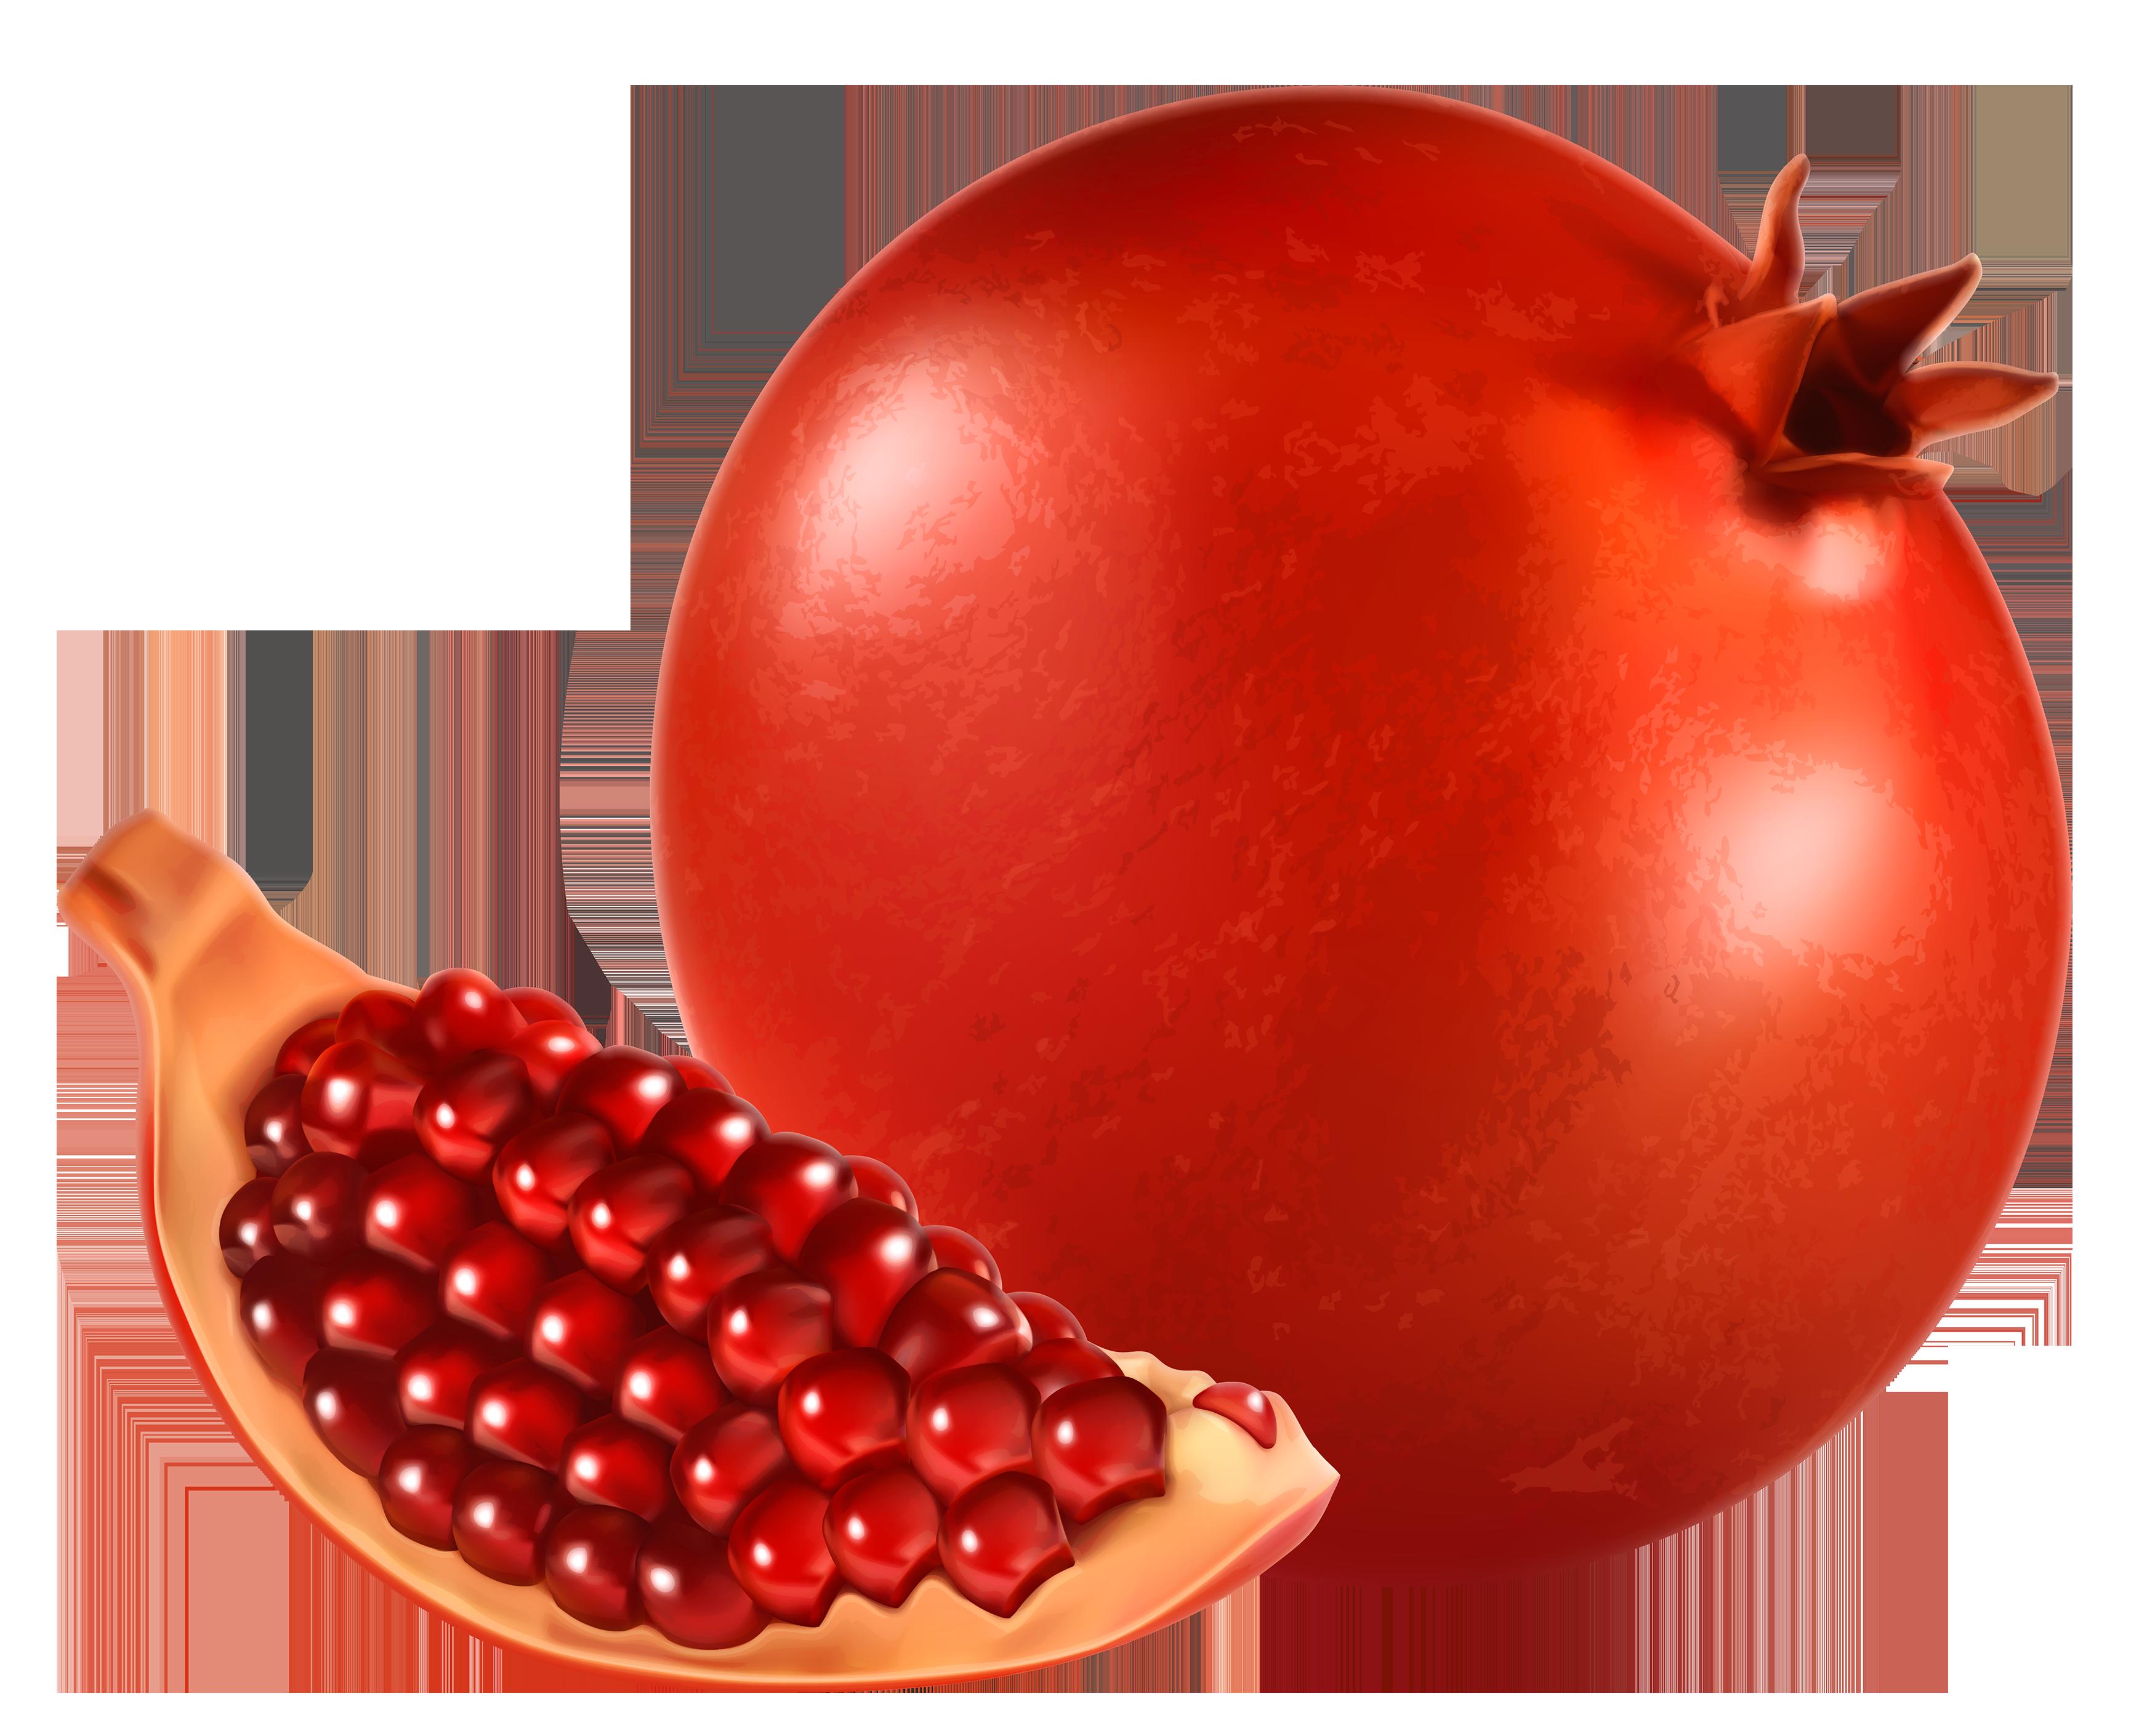 Clipart pomegranate picture black and white stock Pomegranate PNG Clipart - Best WEB Clipart picture black and white stock